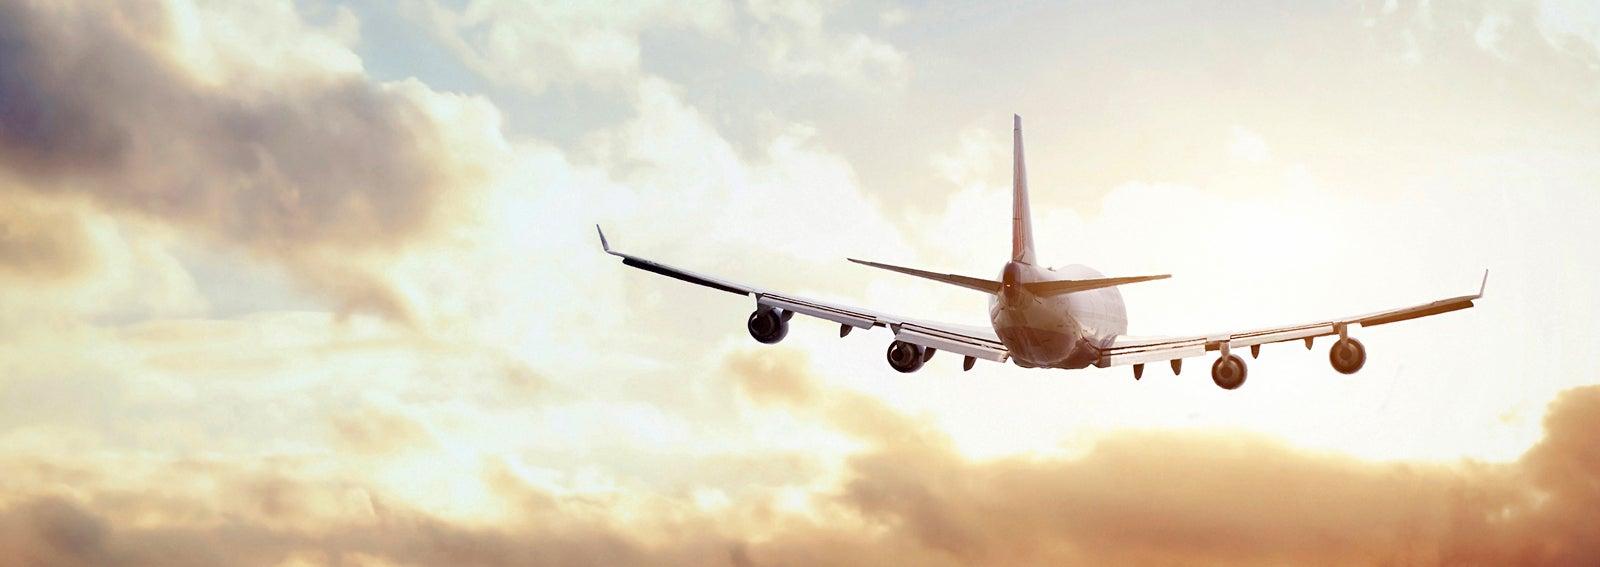 plane-event_image.jpg